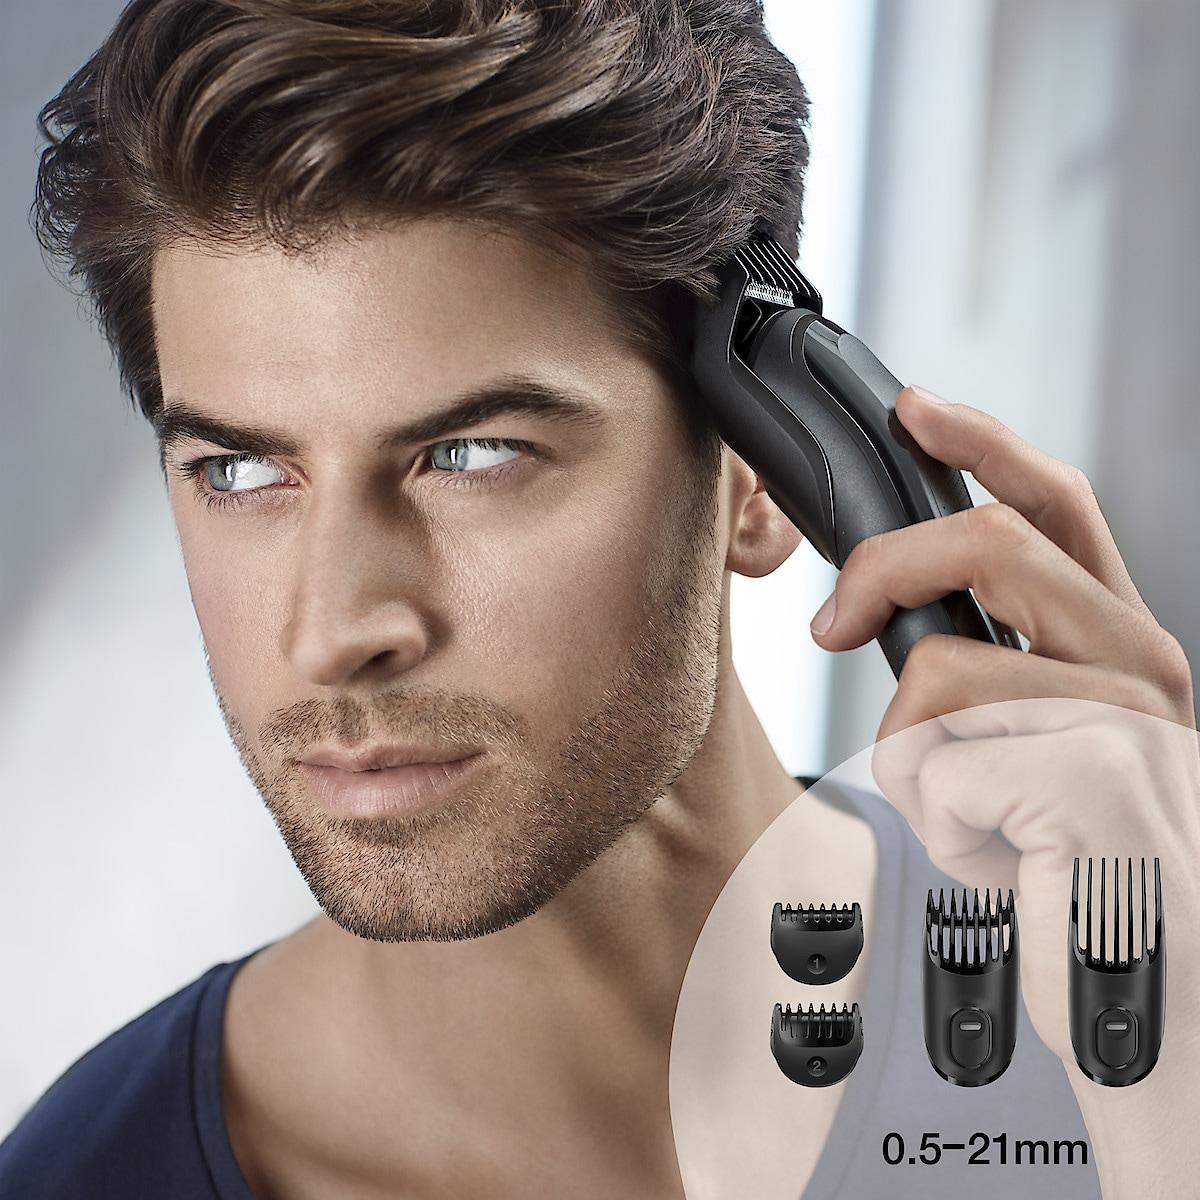 Braun MGK3060 Face & Head, multitrimmer